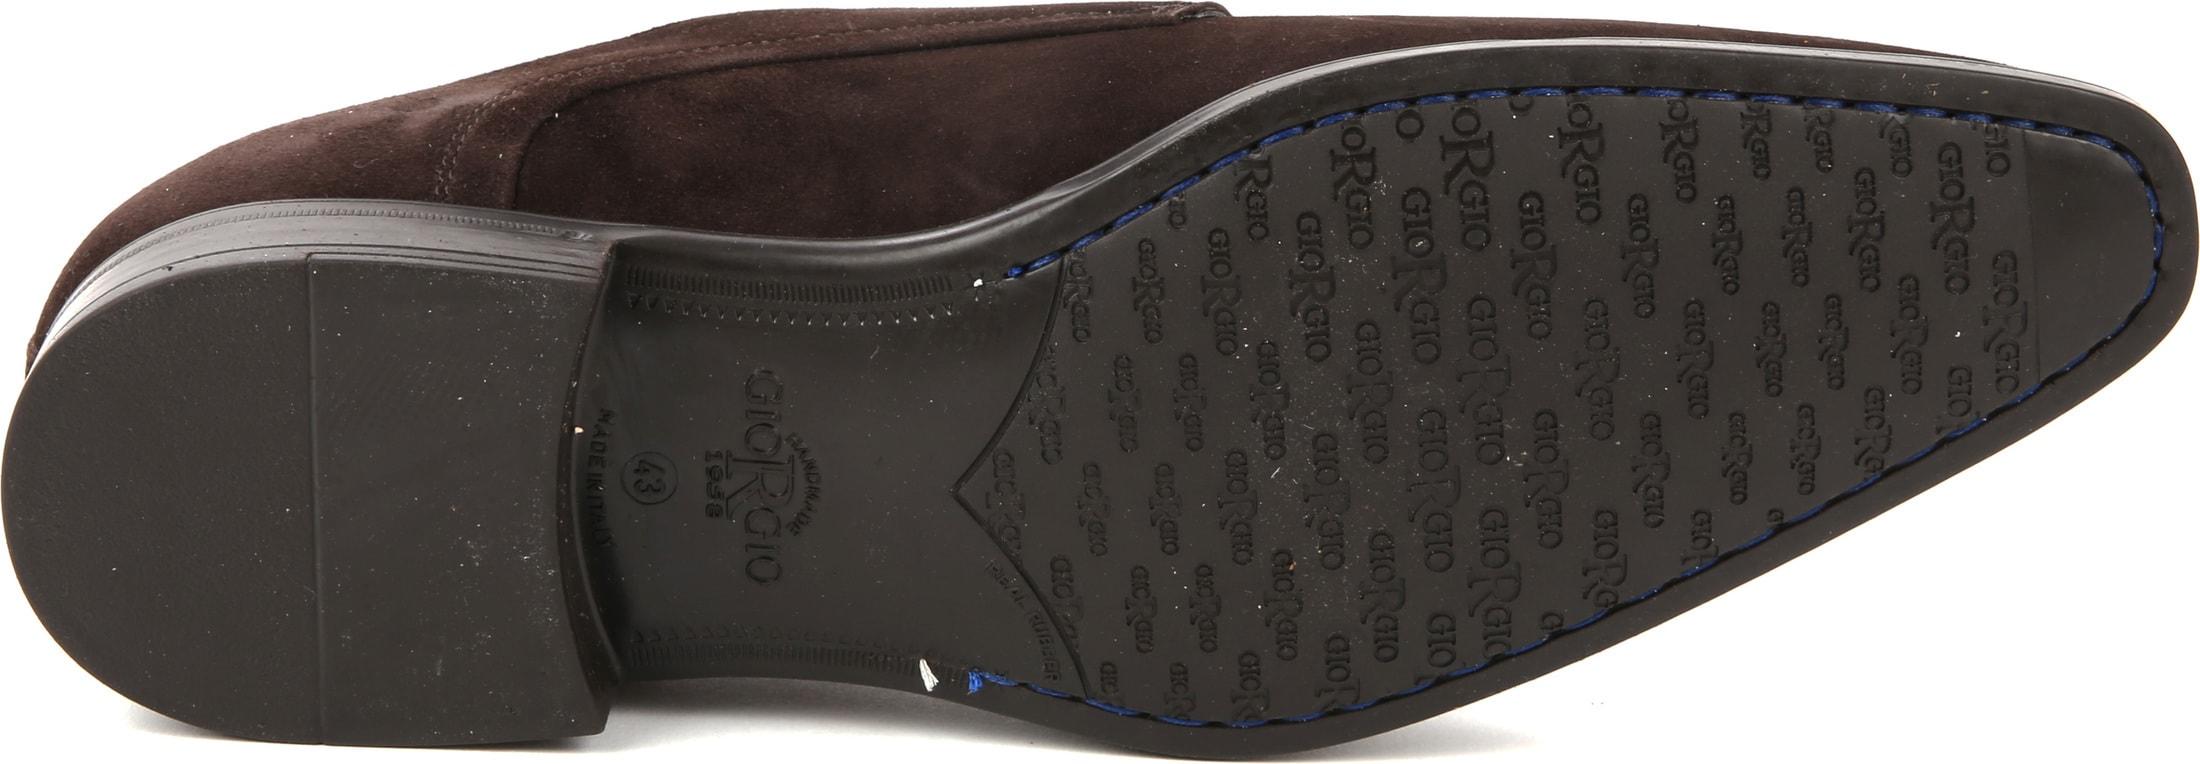 Giorgio Amalfi Shoe Monk Strap Brown Suede photo 3